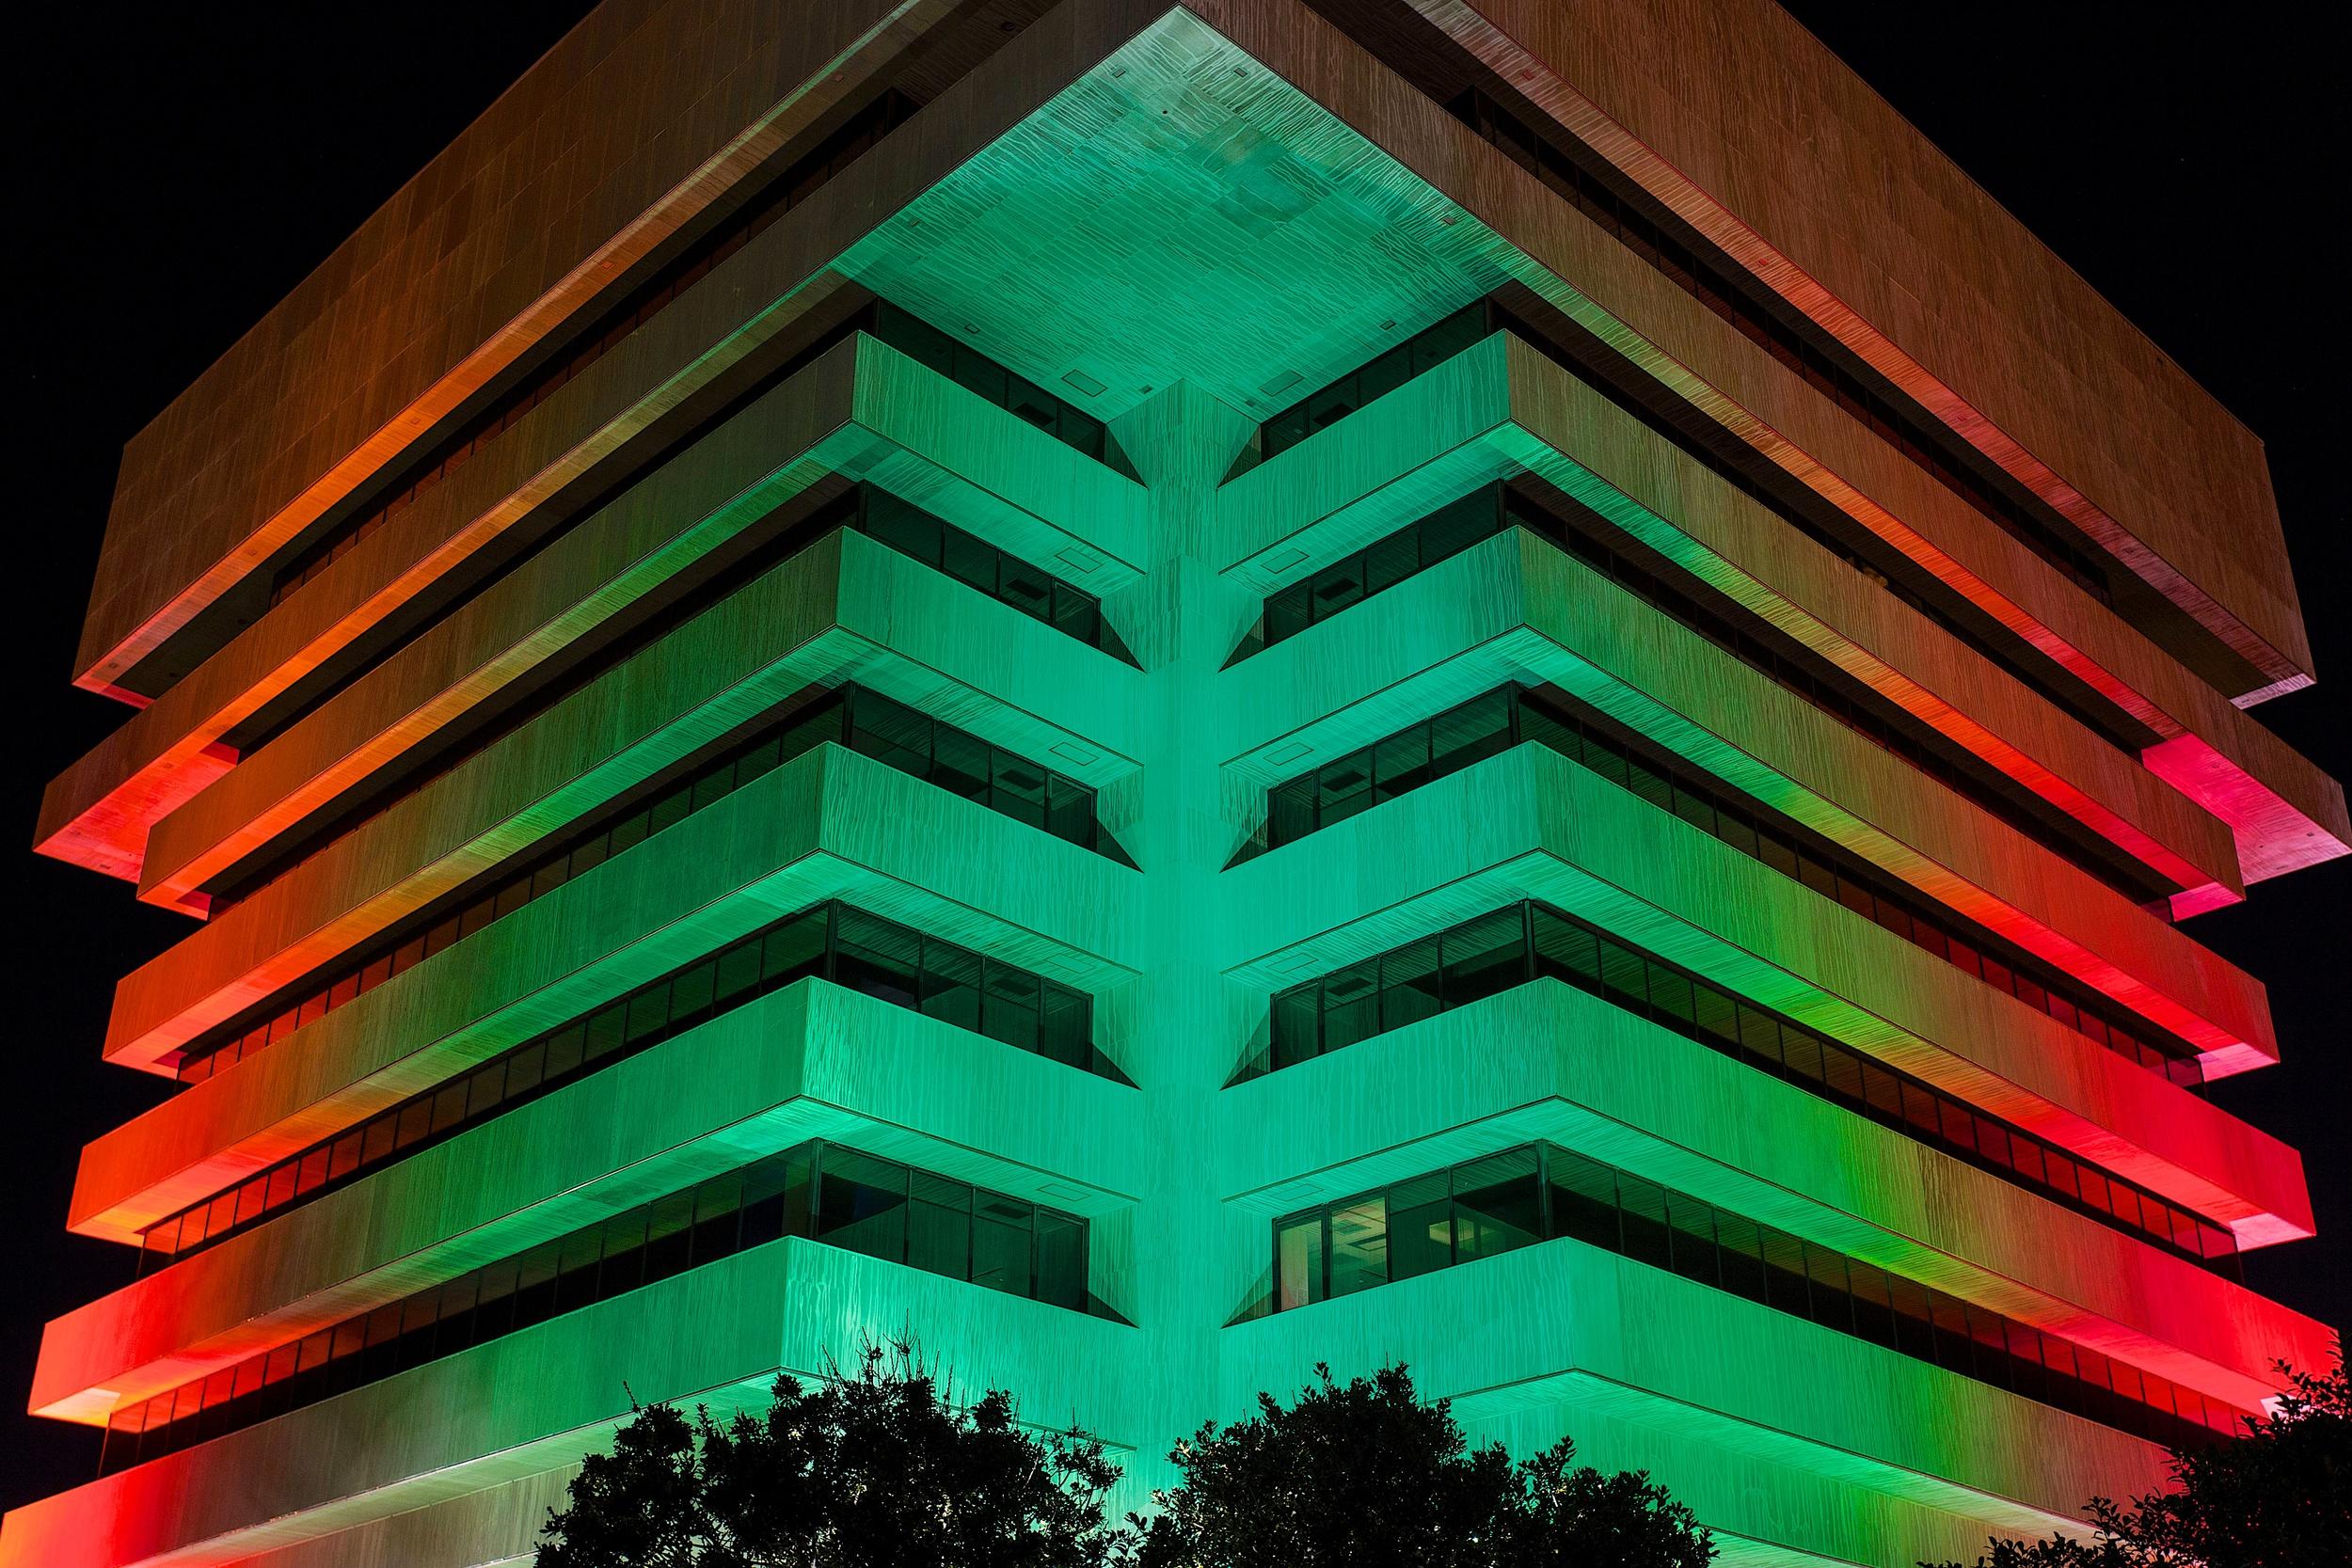 December - Green & Red (Christmas & Kwanzaa)